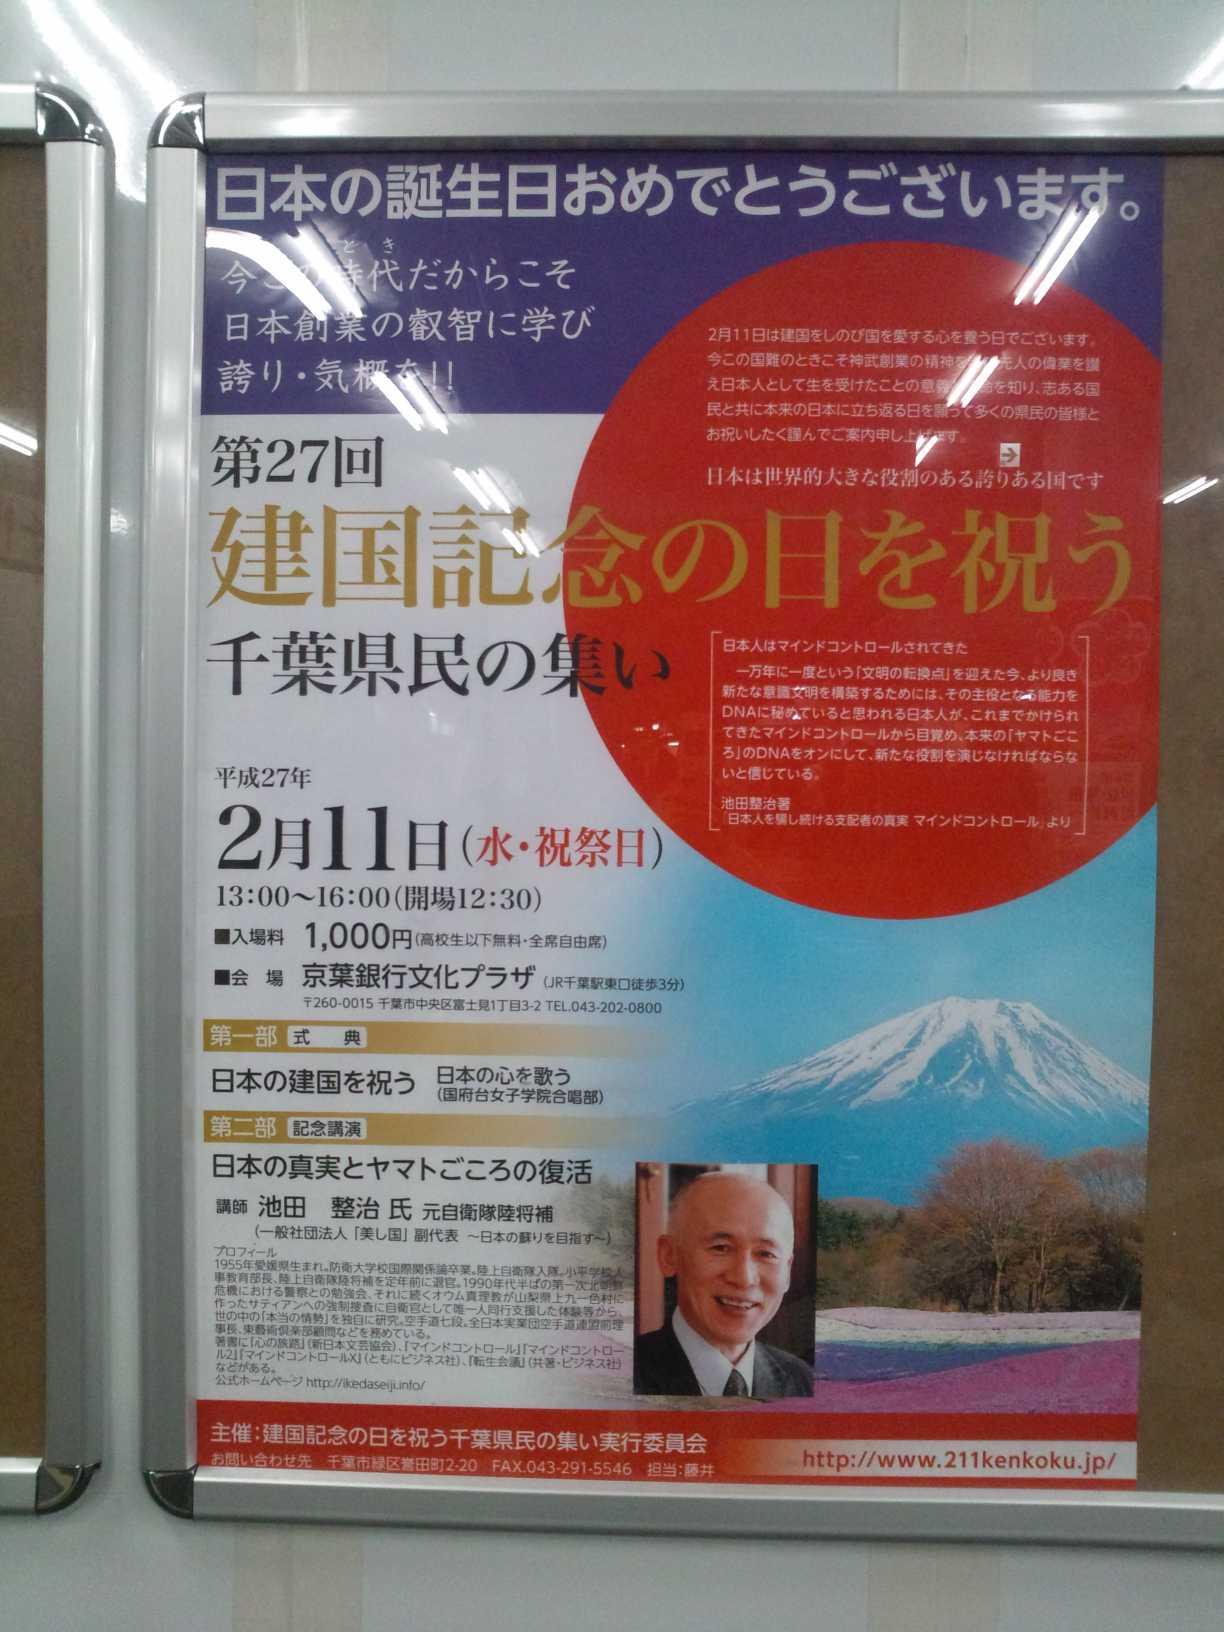 http://211kenkoku.jp/20150206201049s.jpg